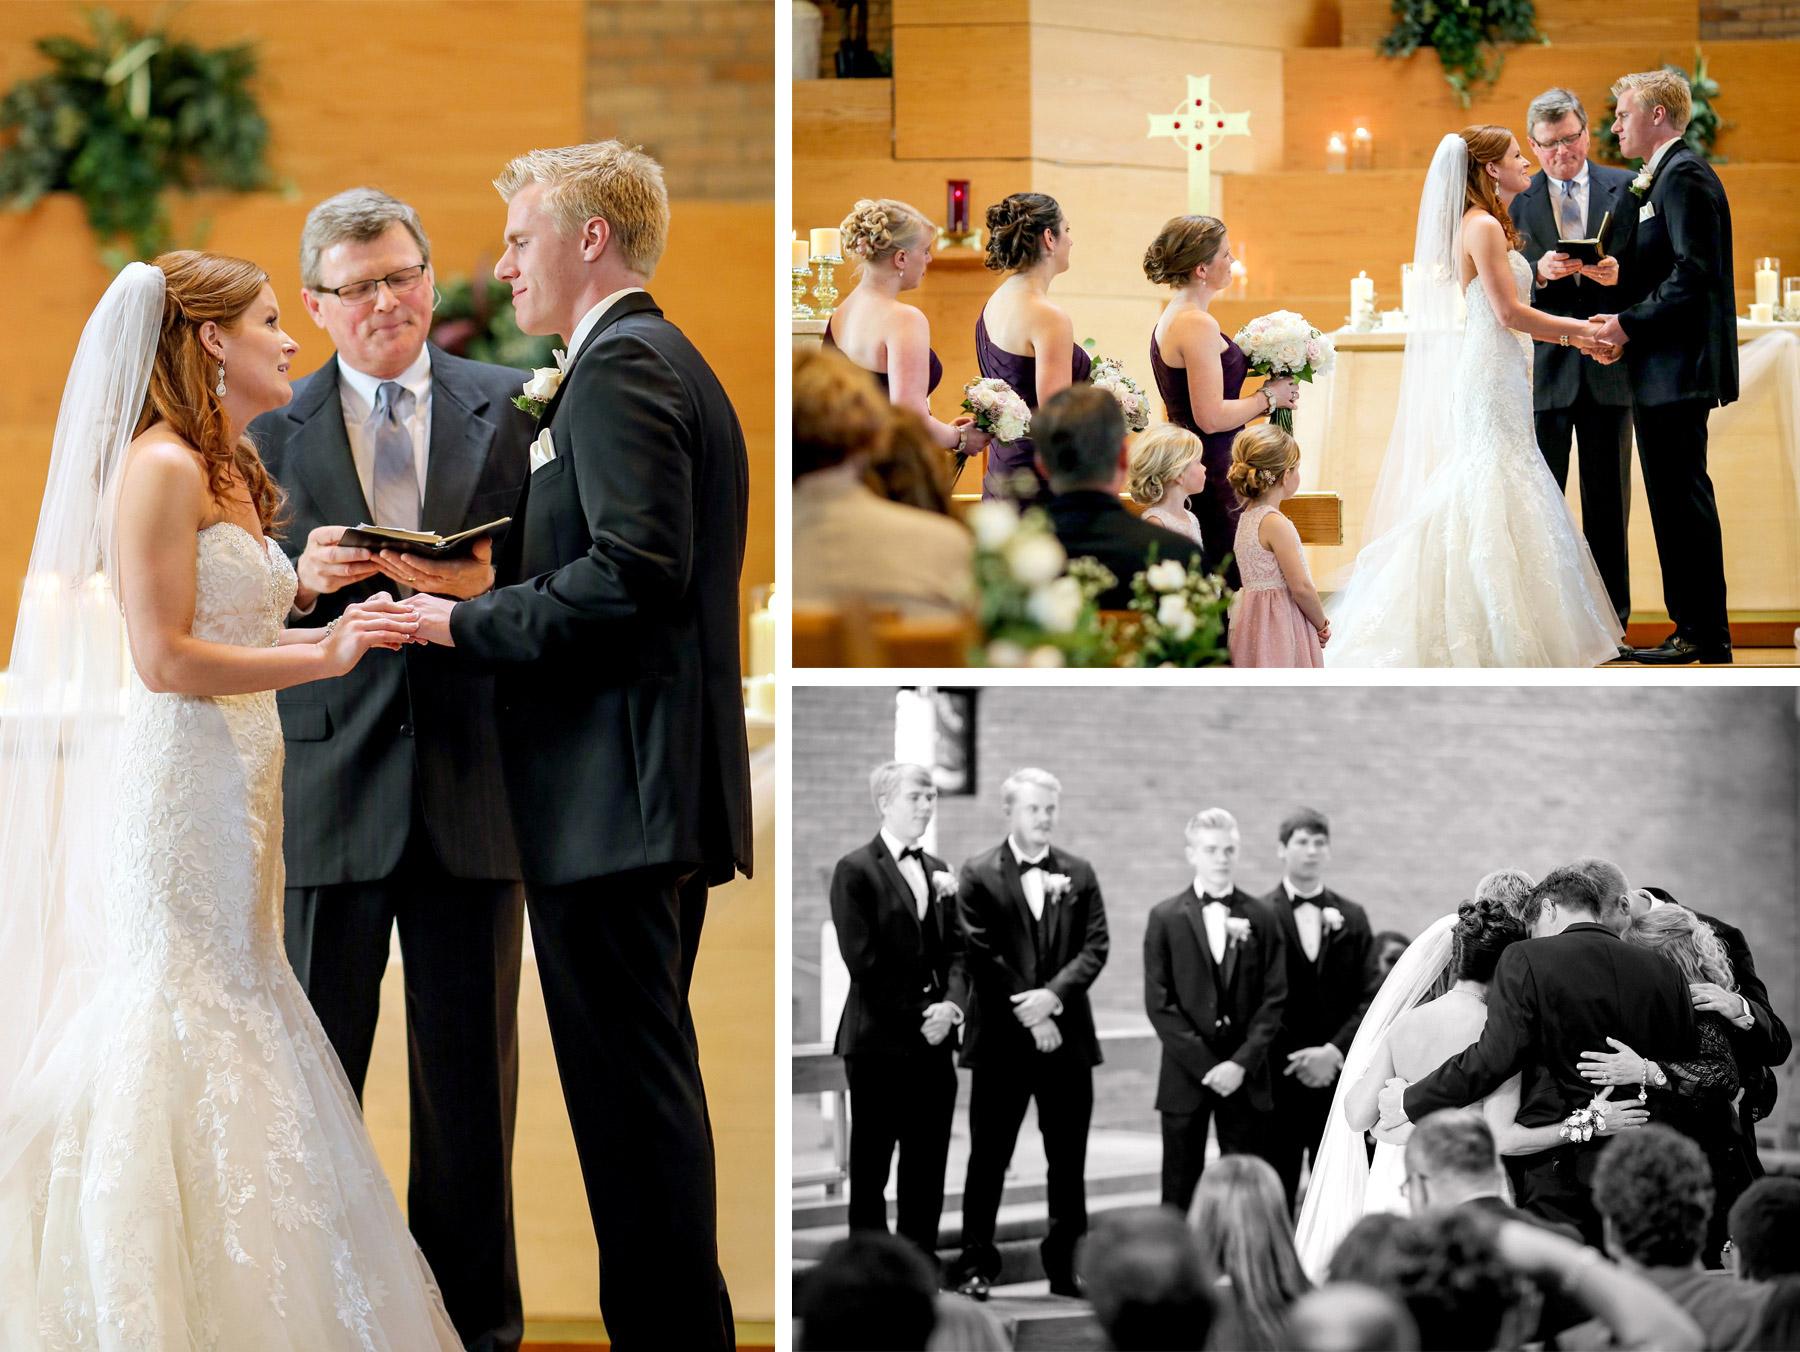 08-Minneapolis-Minnesota-Wedding-Photography-by-Vick-Photography-Ceremony-Woodbury-Lutheran-Church-Tianna-&-Matt.jpg